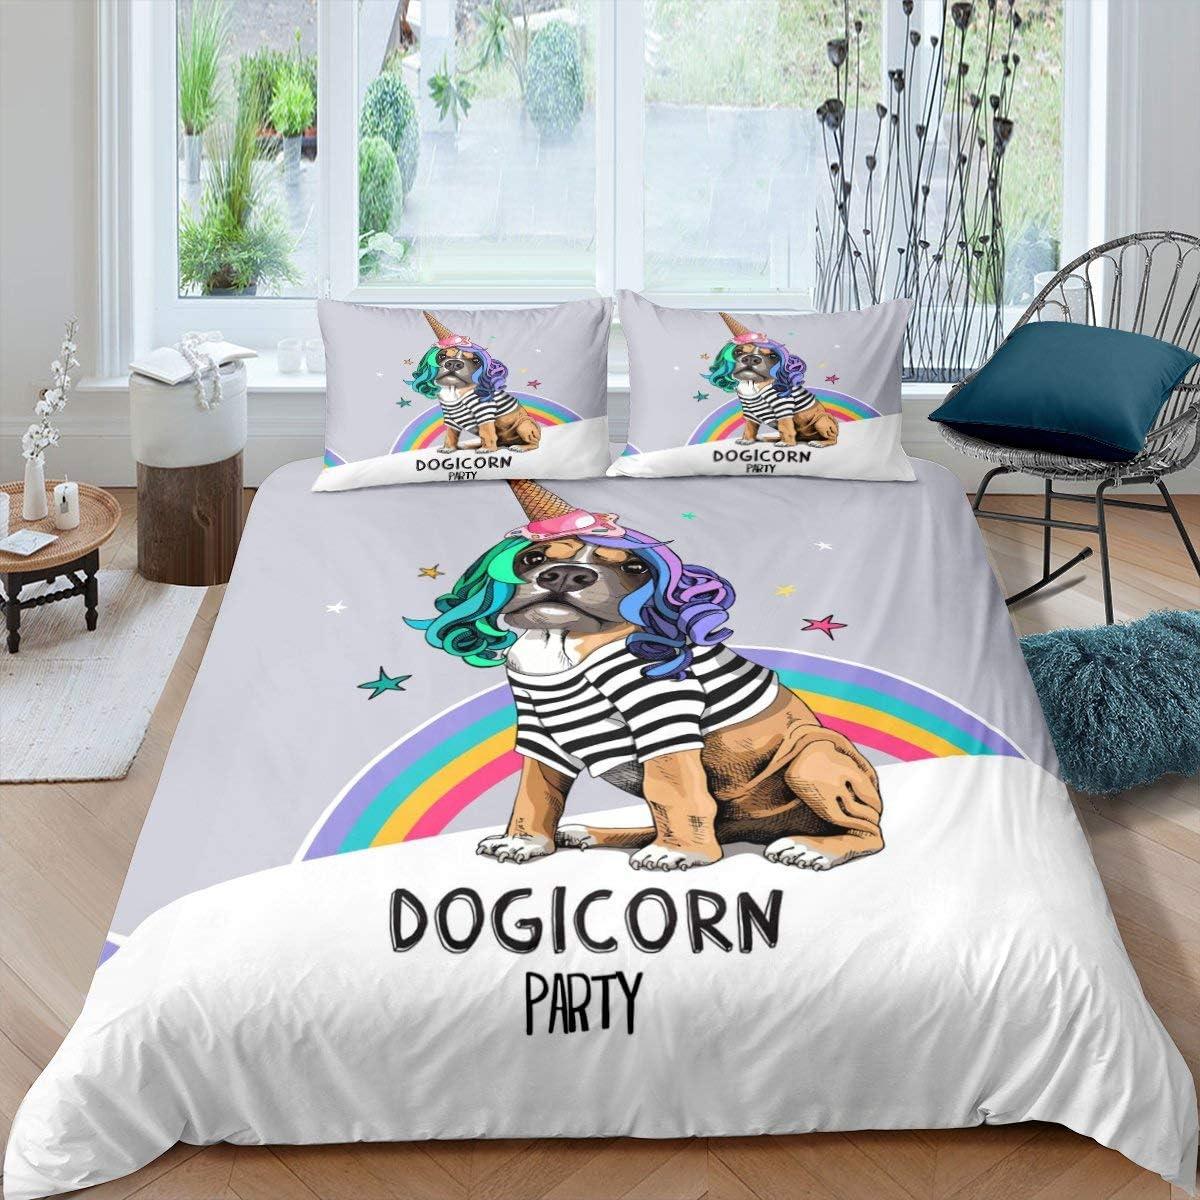 Erosebridal Cartoon Dog Comforter 40%OFFの激安セール 超激安 Cover Pug Duvet Kaw Cute